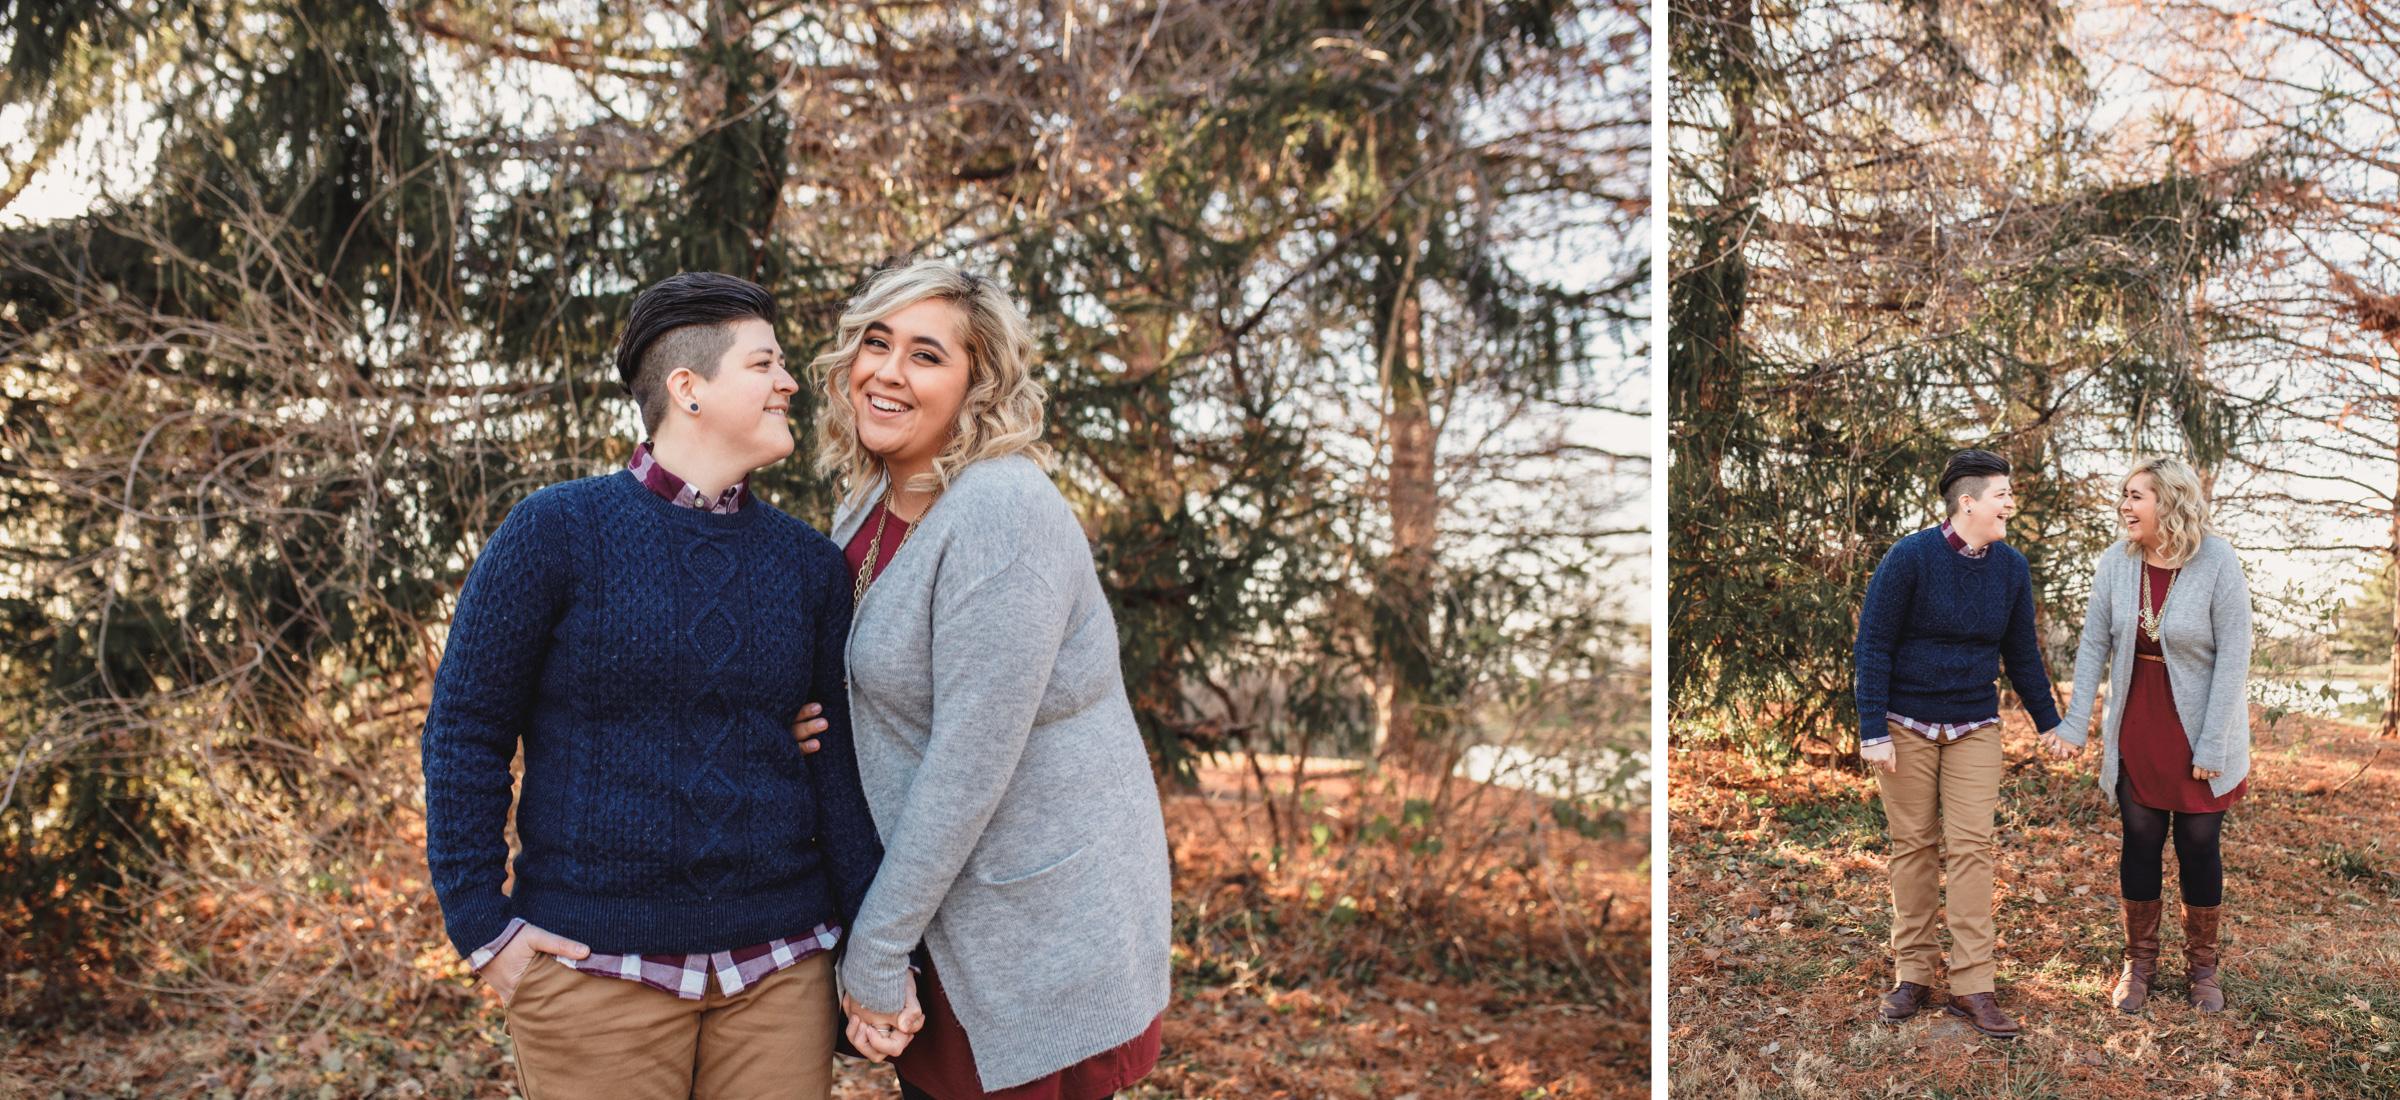 Ica_Scout_LGBT_engagement_shoot_kansas_city_kelsey_diane_photography_2.jpg